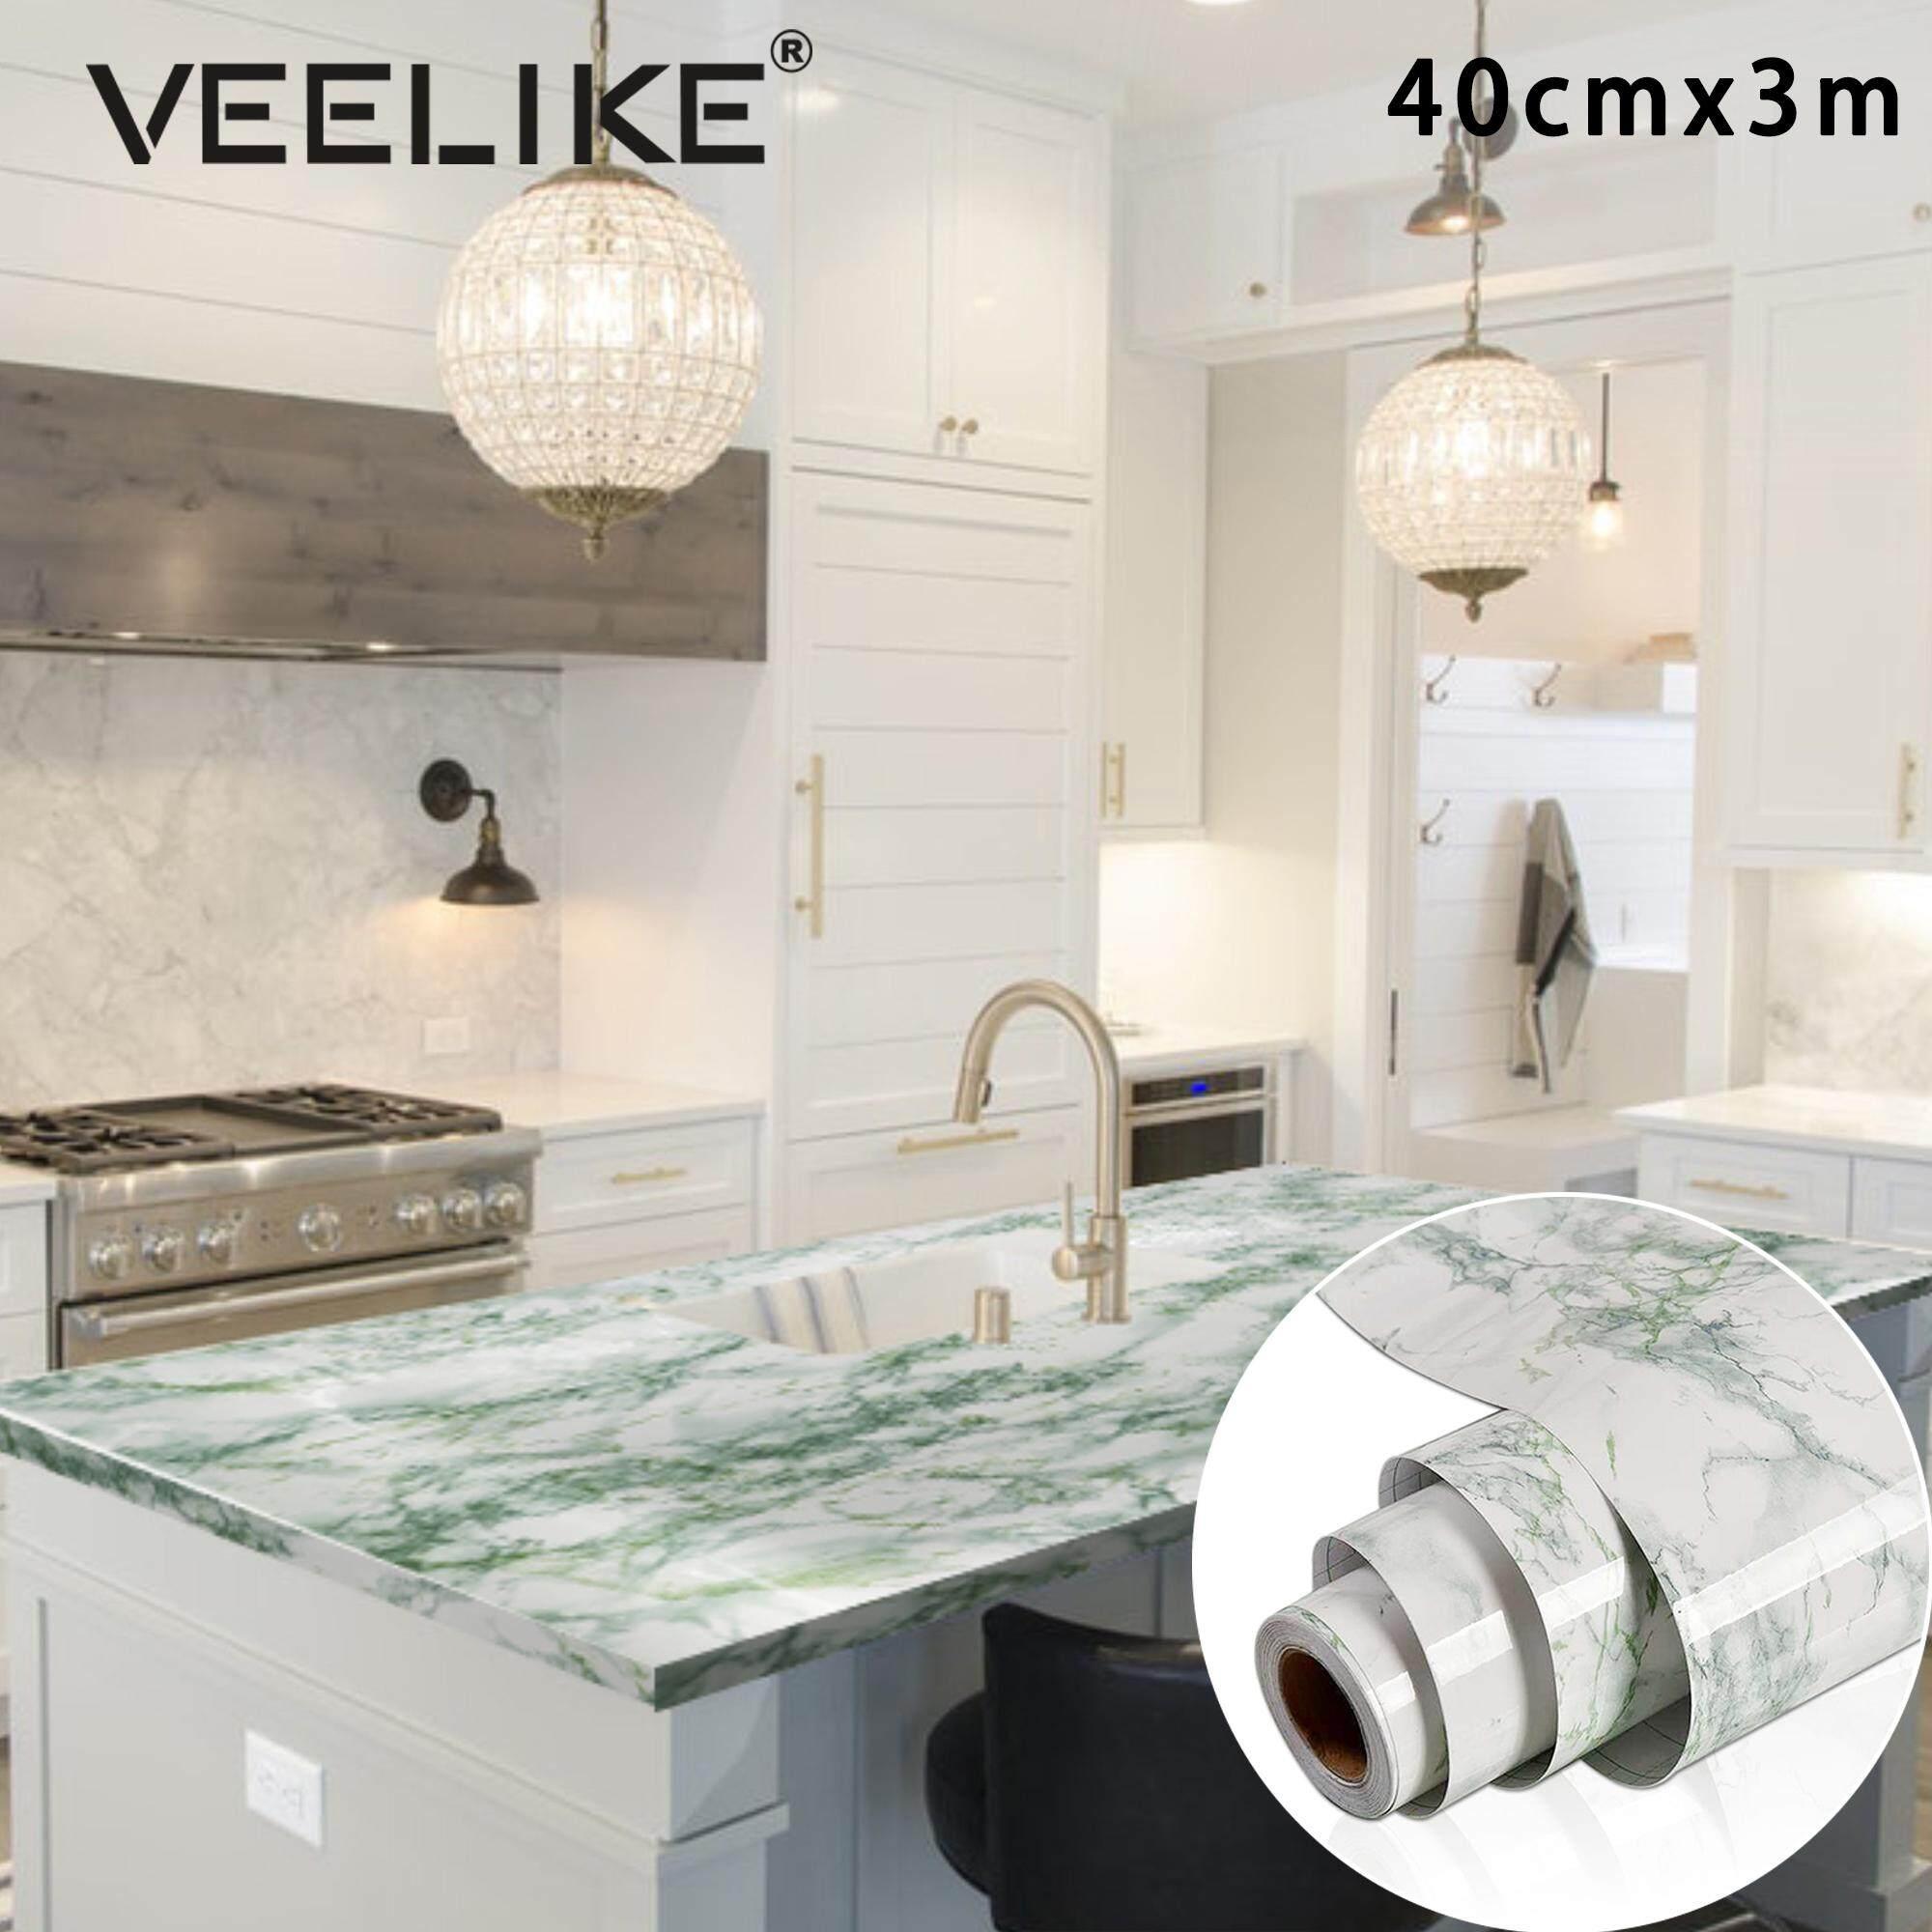 [Hot Sale]Veelike 40cmX300cm Marble Vinyl Film Self Adhesive Wallpaper for Bathroom Kitchen Cupboard Countertops Contact Paper PVC Waterproof Wall Stickers